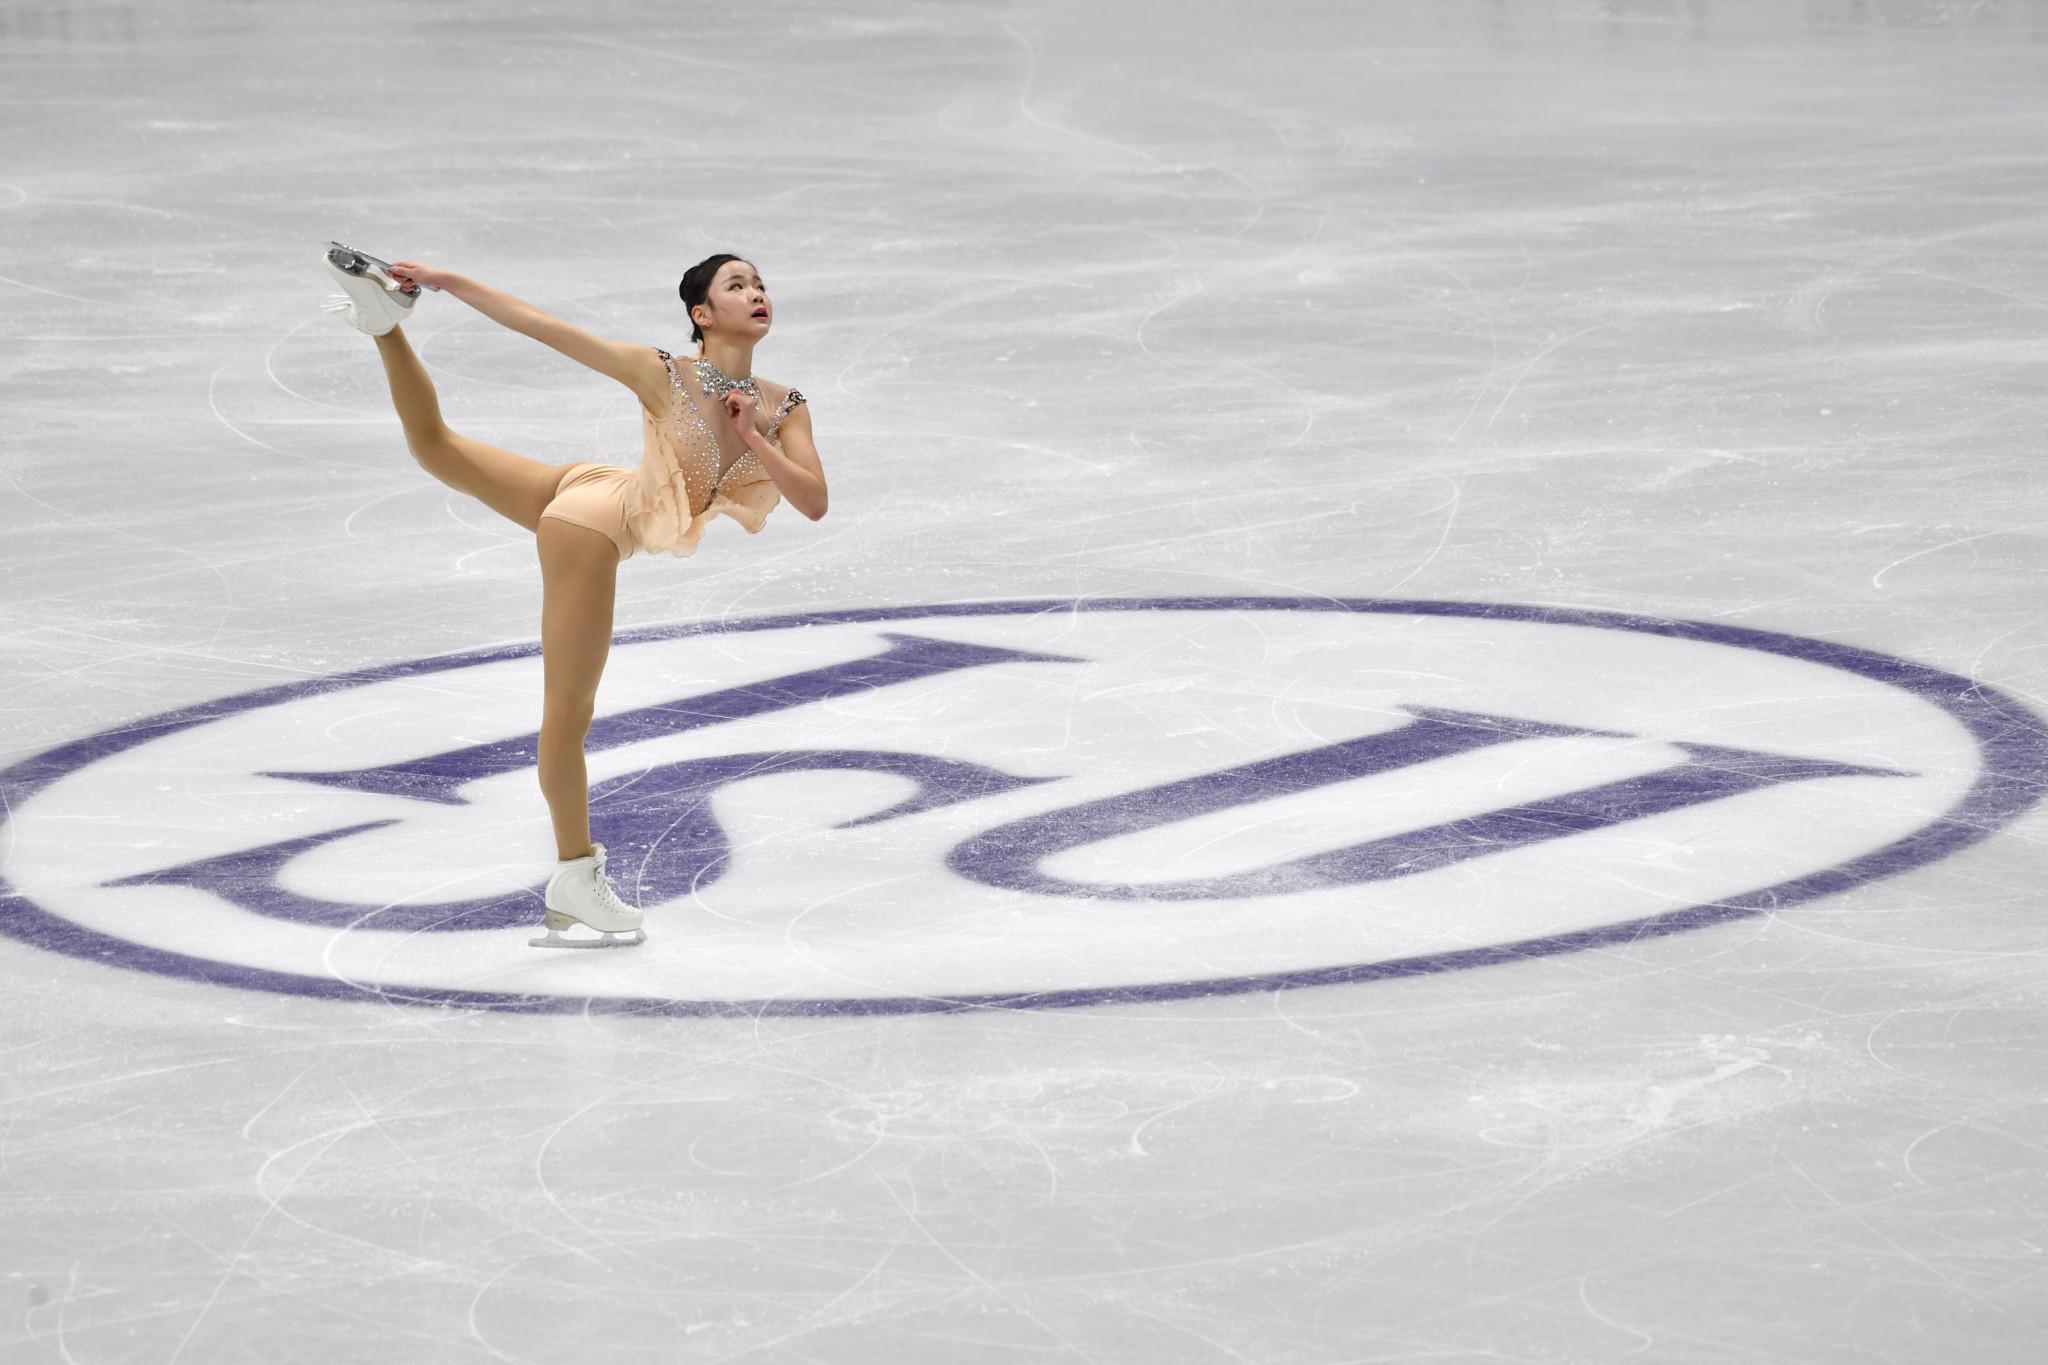 ISU to discuss raising age limit of figure skaters following death of Alexandrovskaya